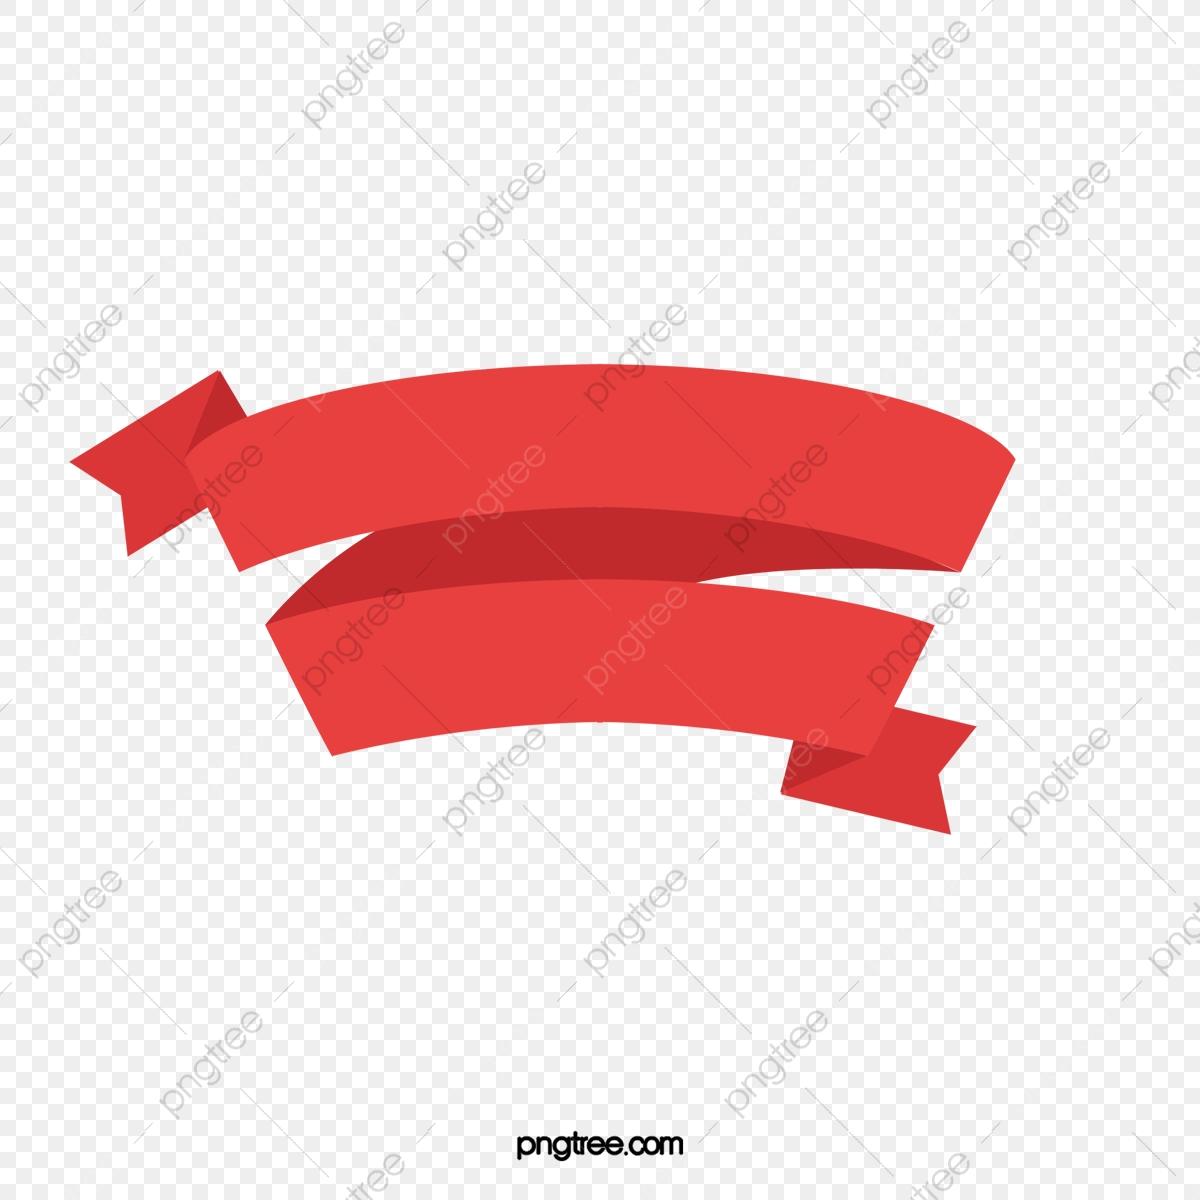 Cartoon Red Ribbon Png Material Frame, Cartoon Clipart, Ribbon ... vector stock